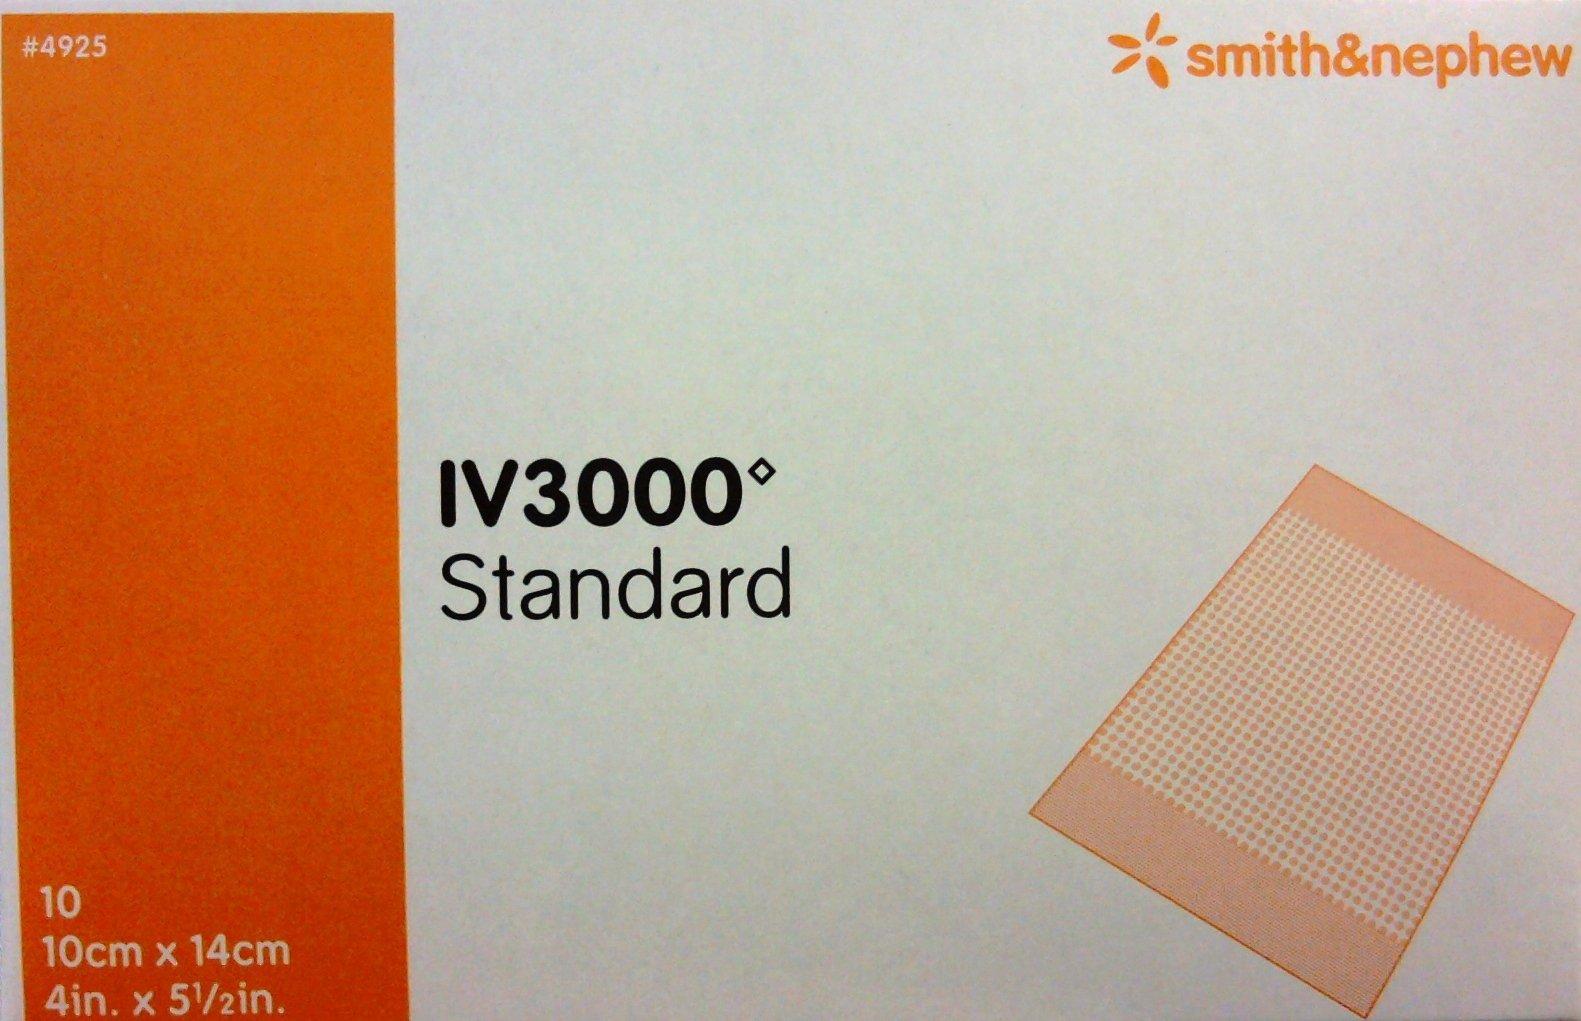 OpSite IV 3000 Dressing 4'' x 5 1/2'' Box: 10